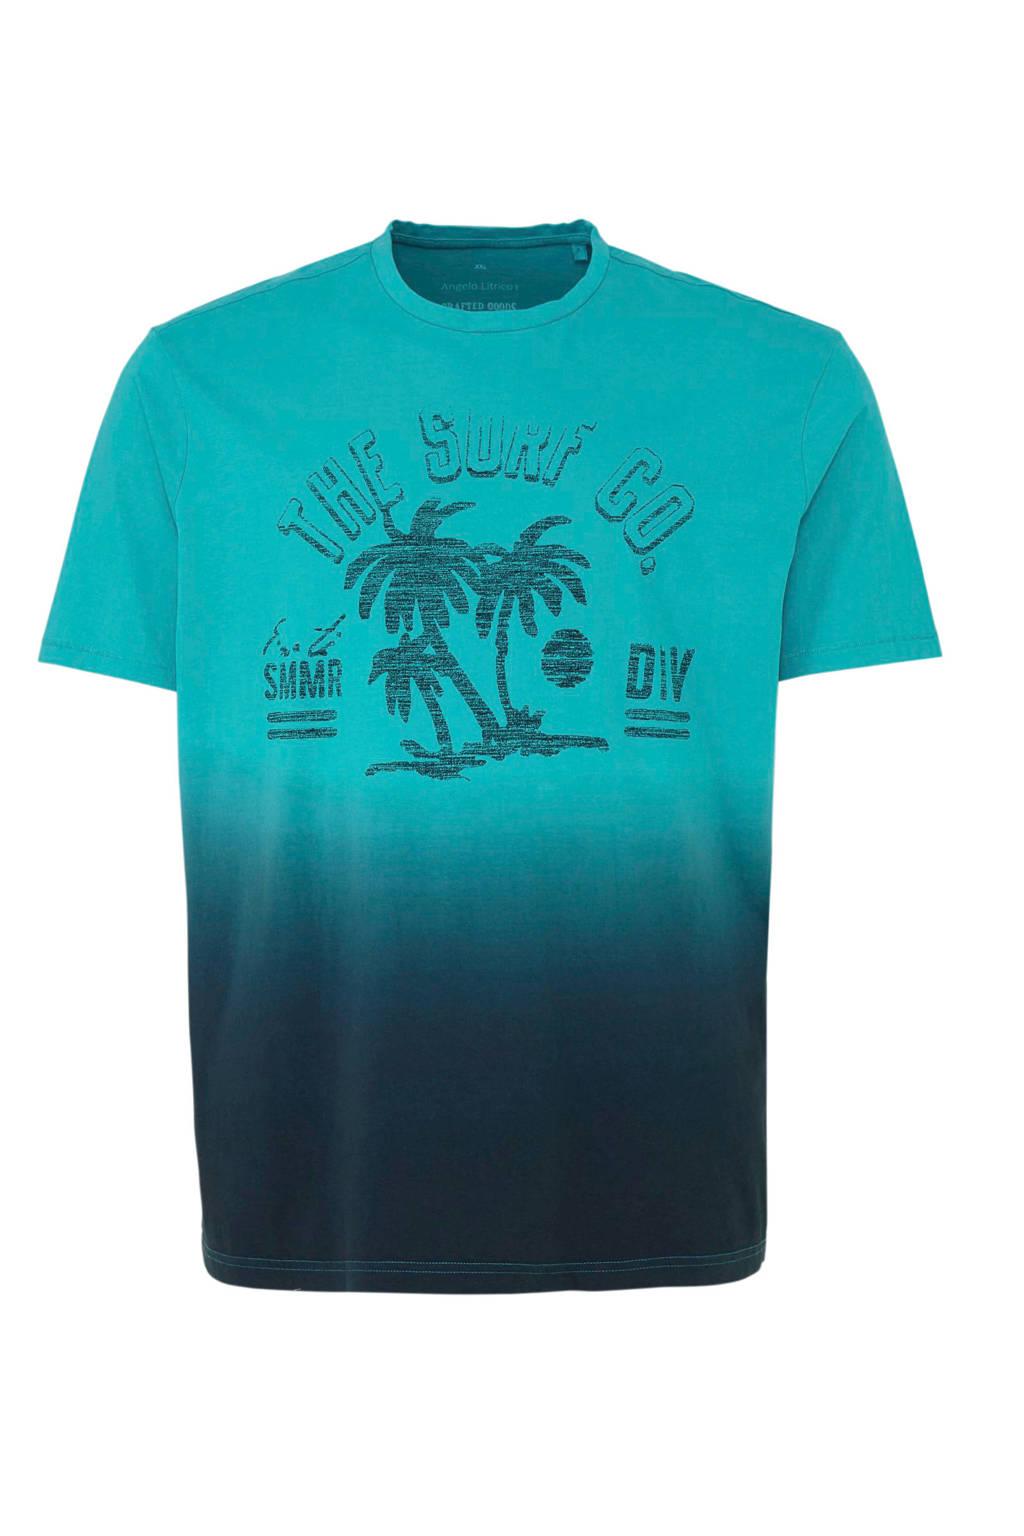 C&A XL Angelo Litrico T-shirt met printopdruk, Turquoise